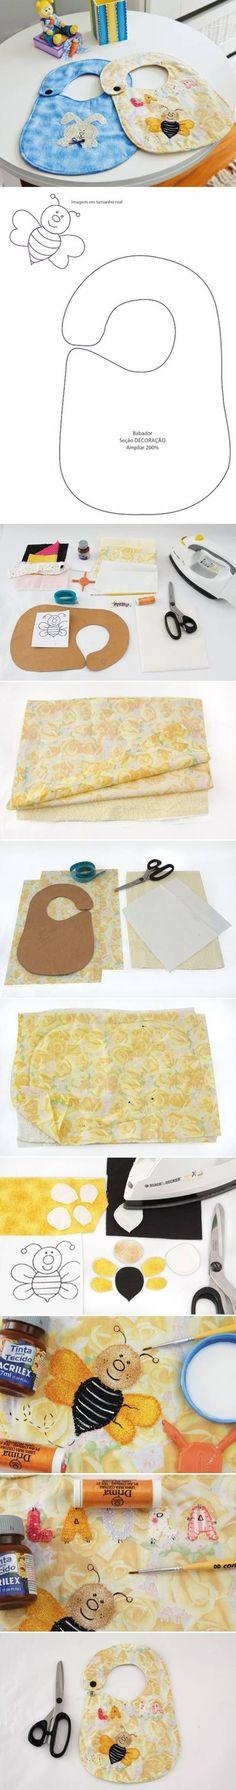 Baberos para bebes DIY DIY Proyectos / UsefulDIY.com